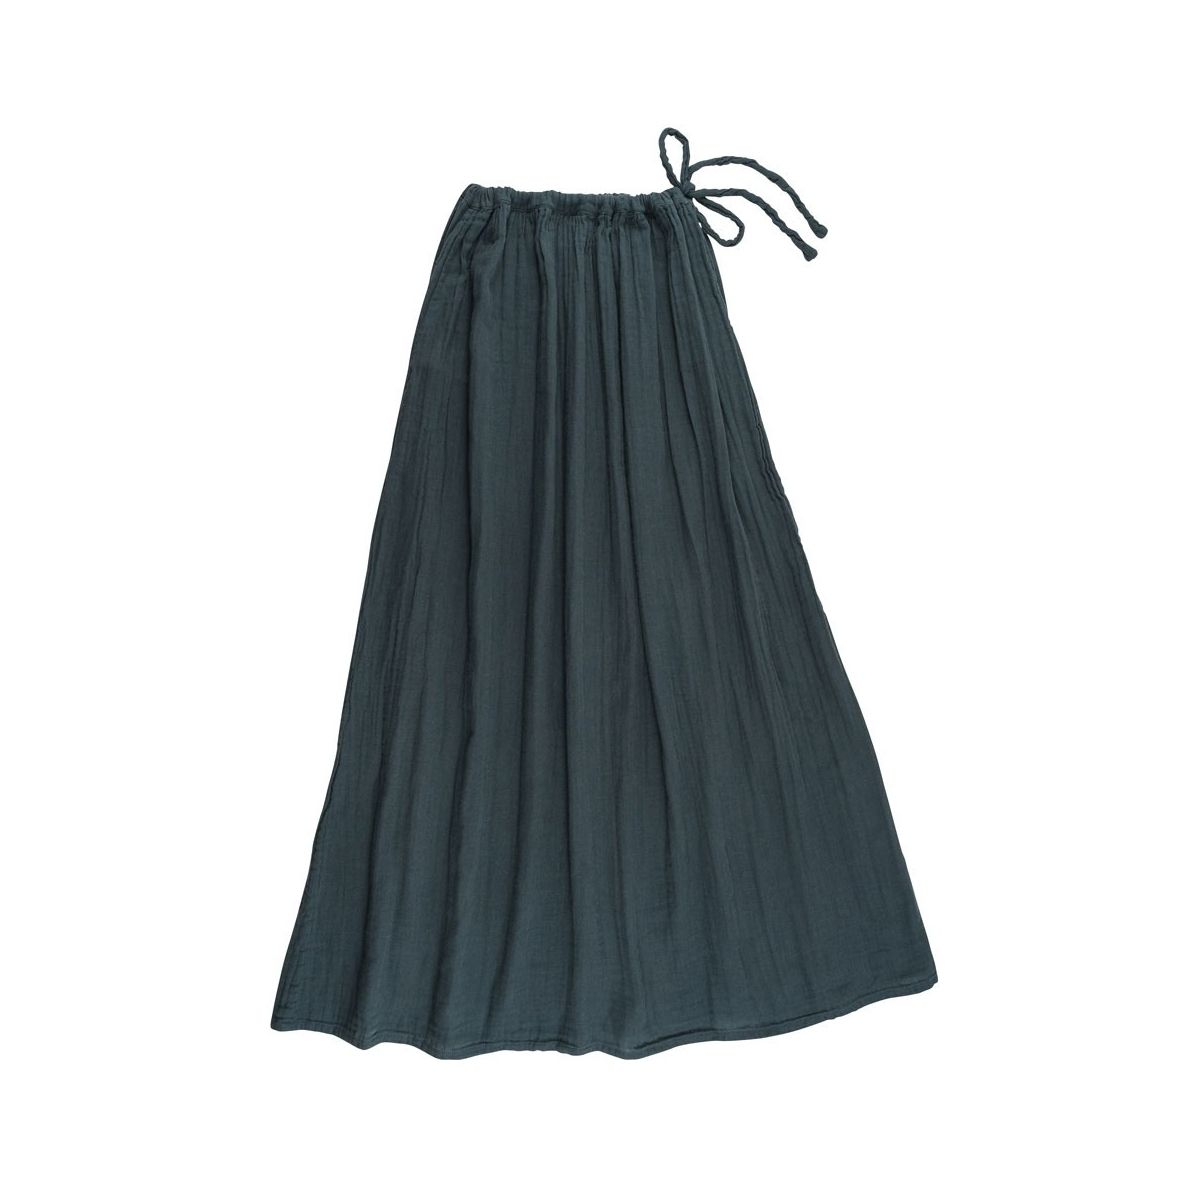 Skirt for mum Ava long ice blue - Numero 74